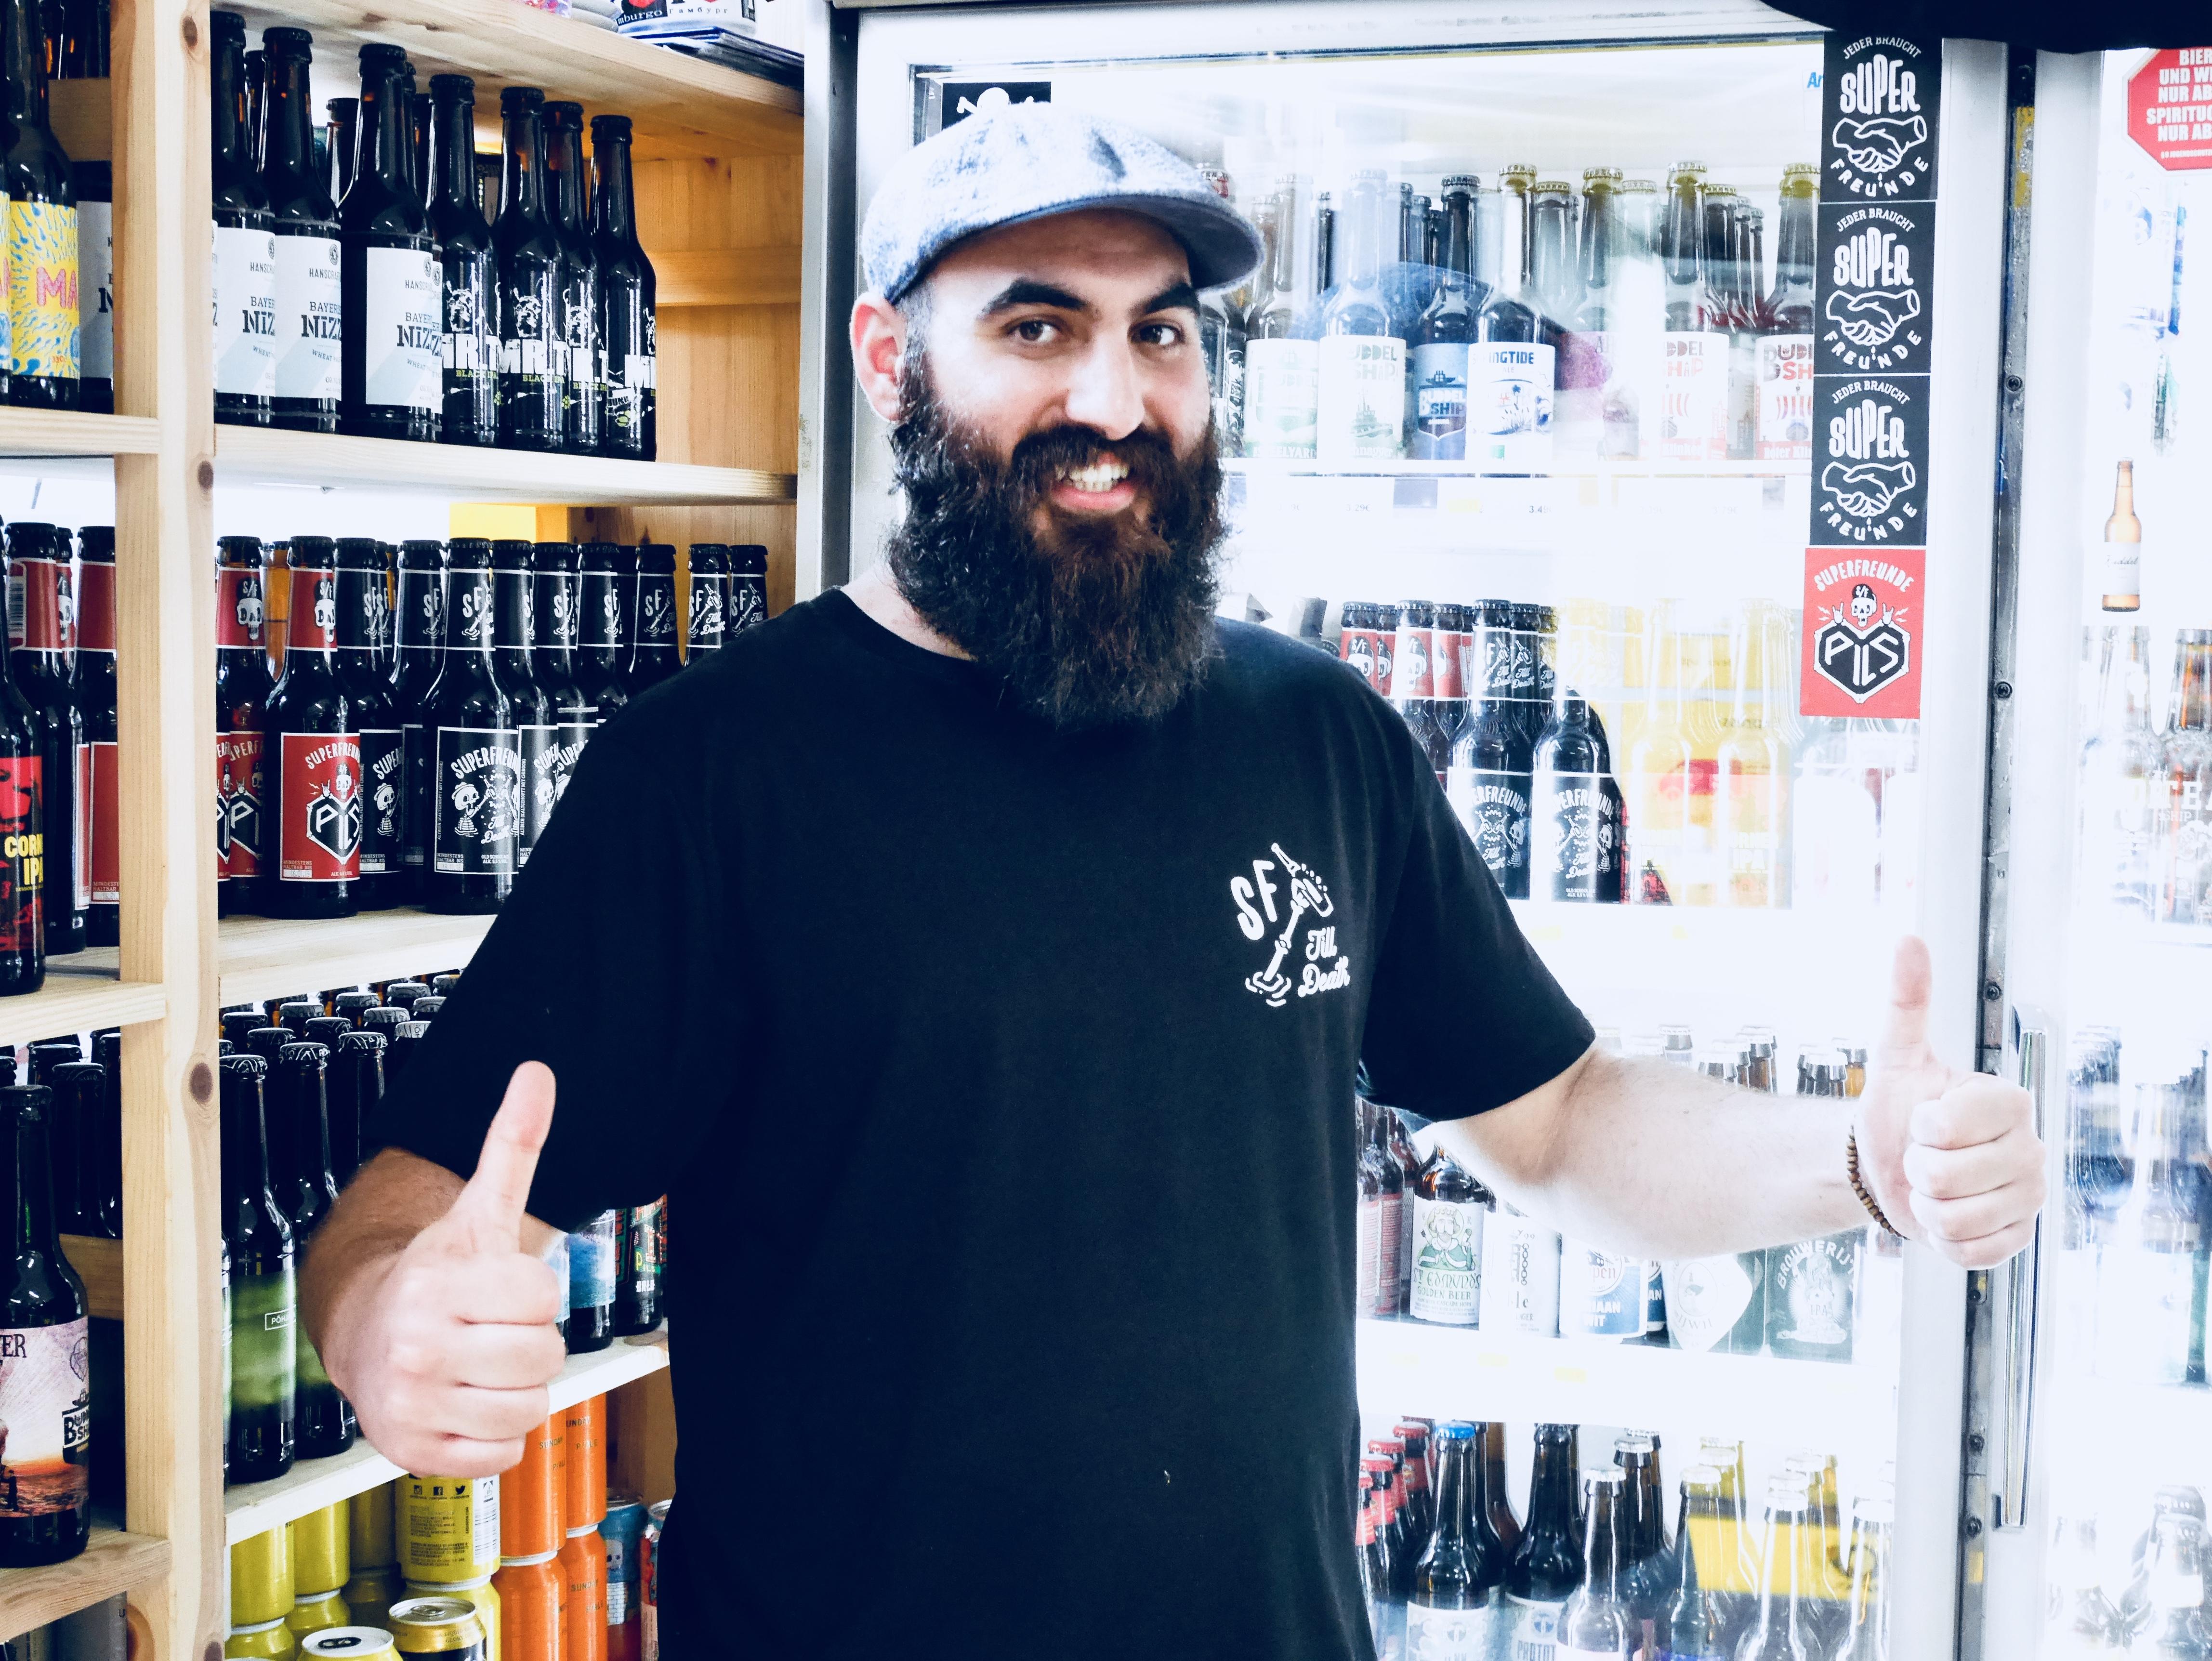 Erkan Altun TipTop Kiosk HHopcast Podcast Bier-Podcast